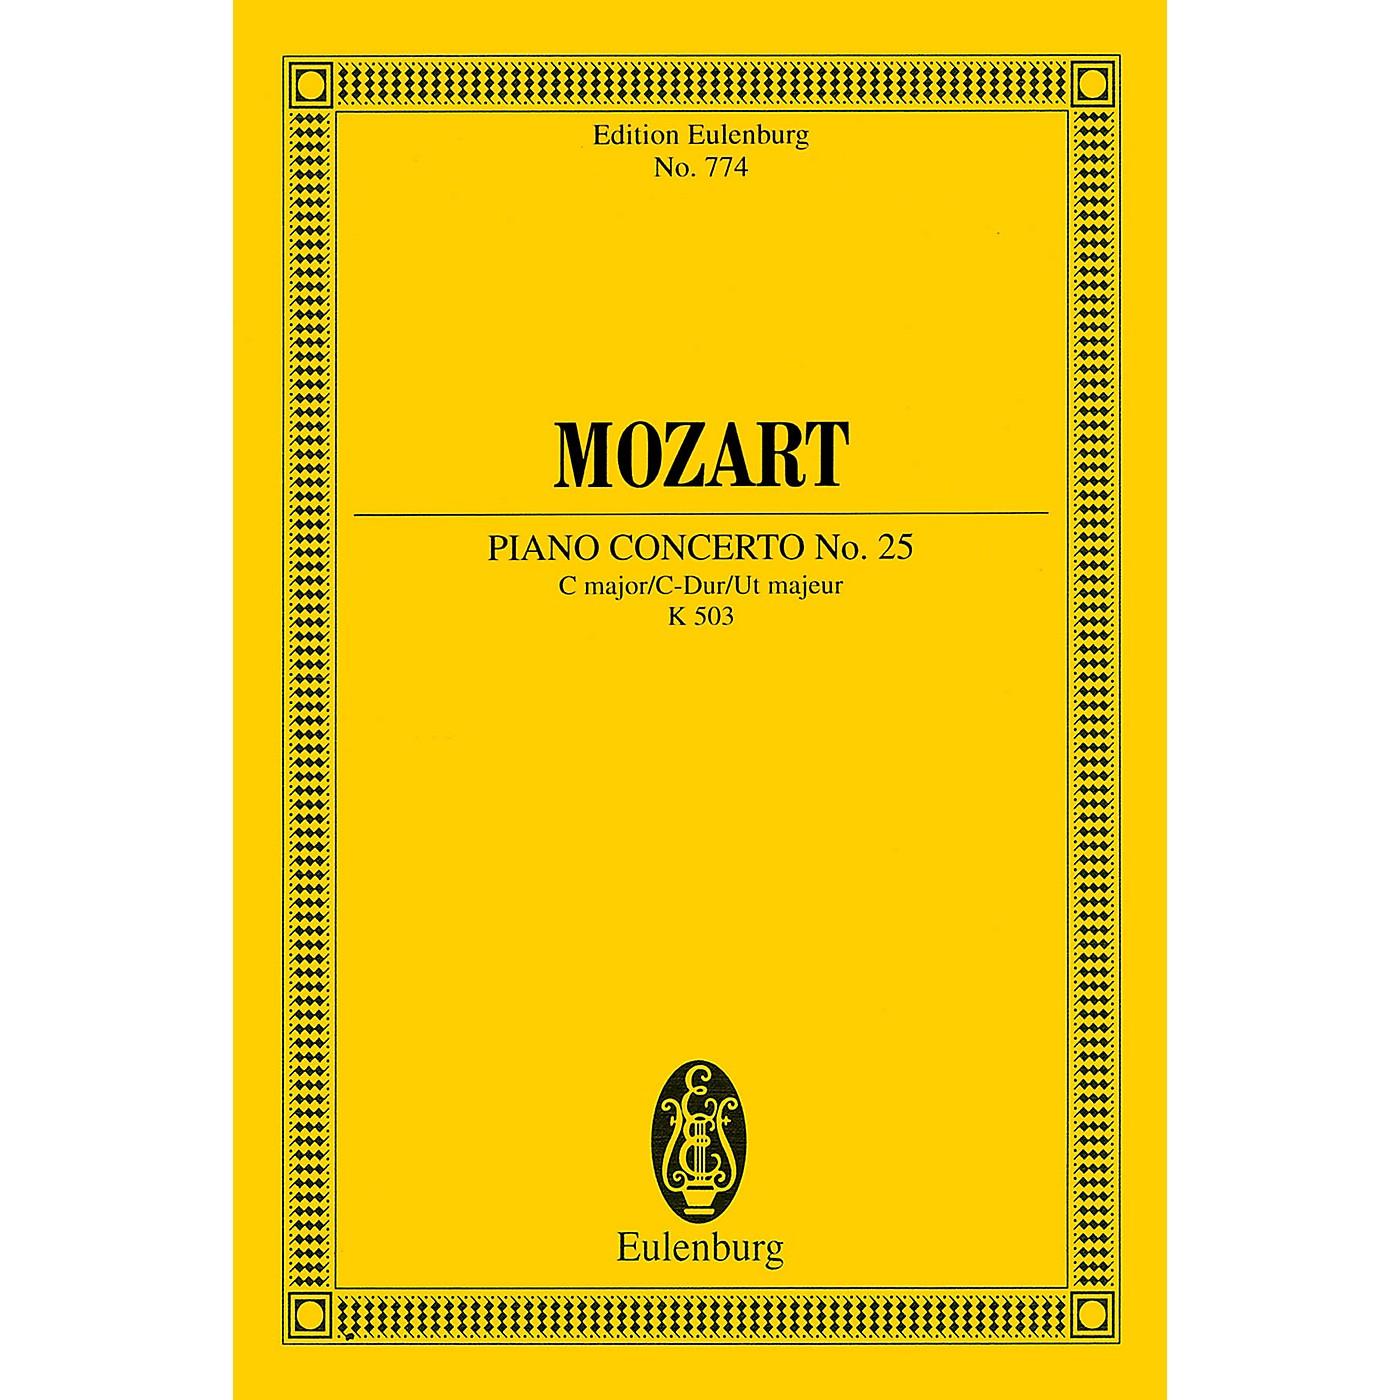 Eulenburg Piano Concerto No. 25 in C Major, K. 503 Schott by Mozart Arranged by Friedrich Blume thumbnail